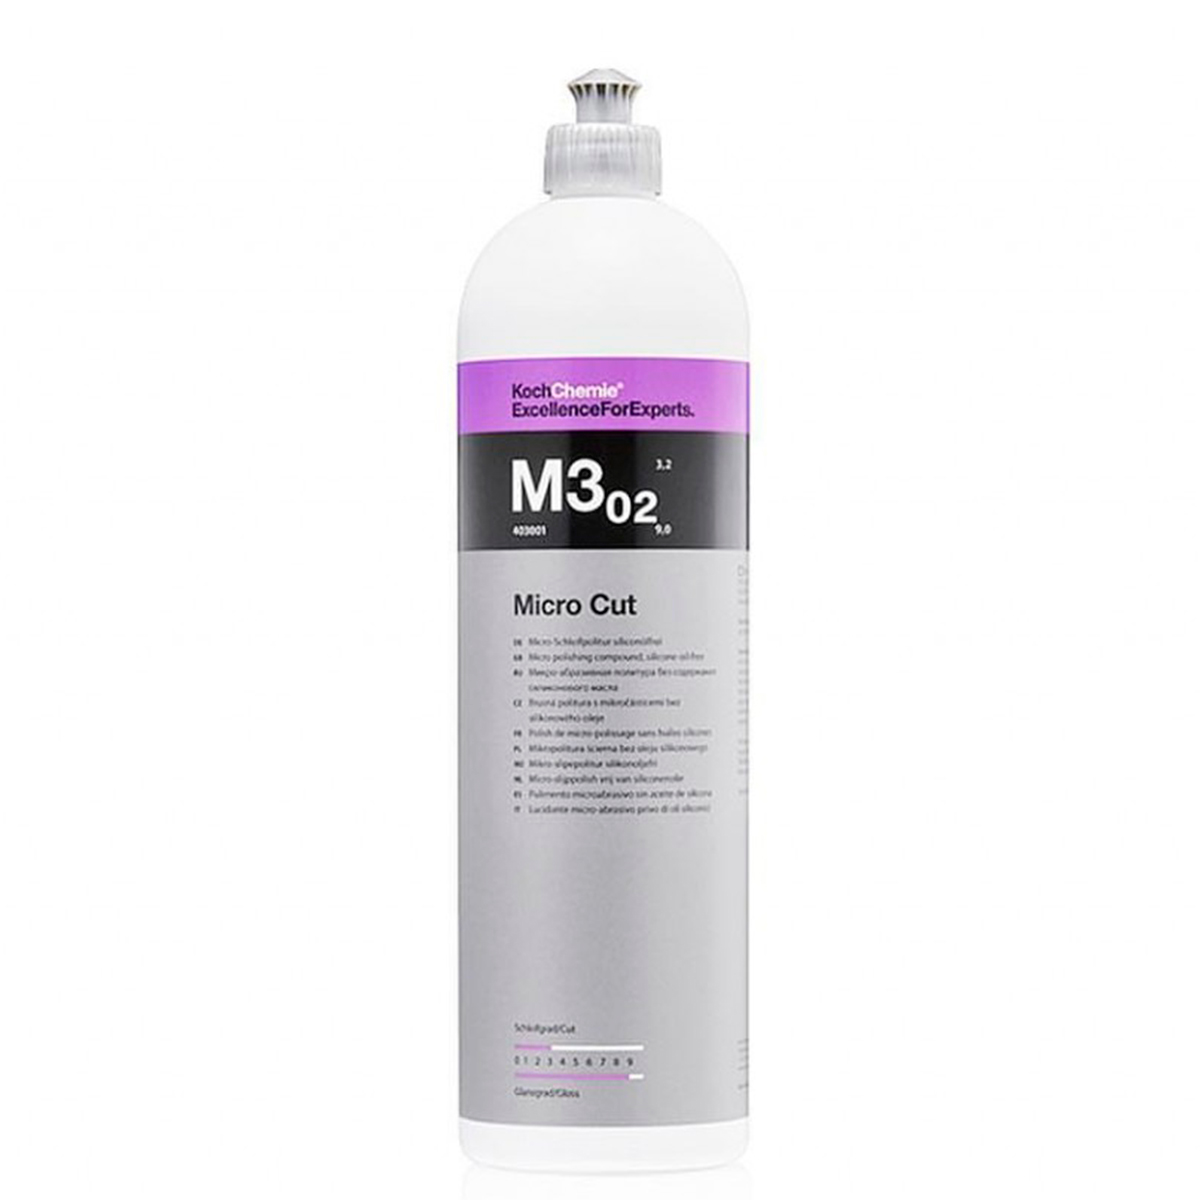 M3 02 Micro Cut Lustro e Alto Brilho 1L - Koch Chemie